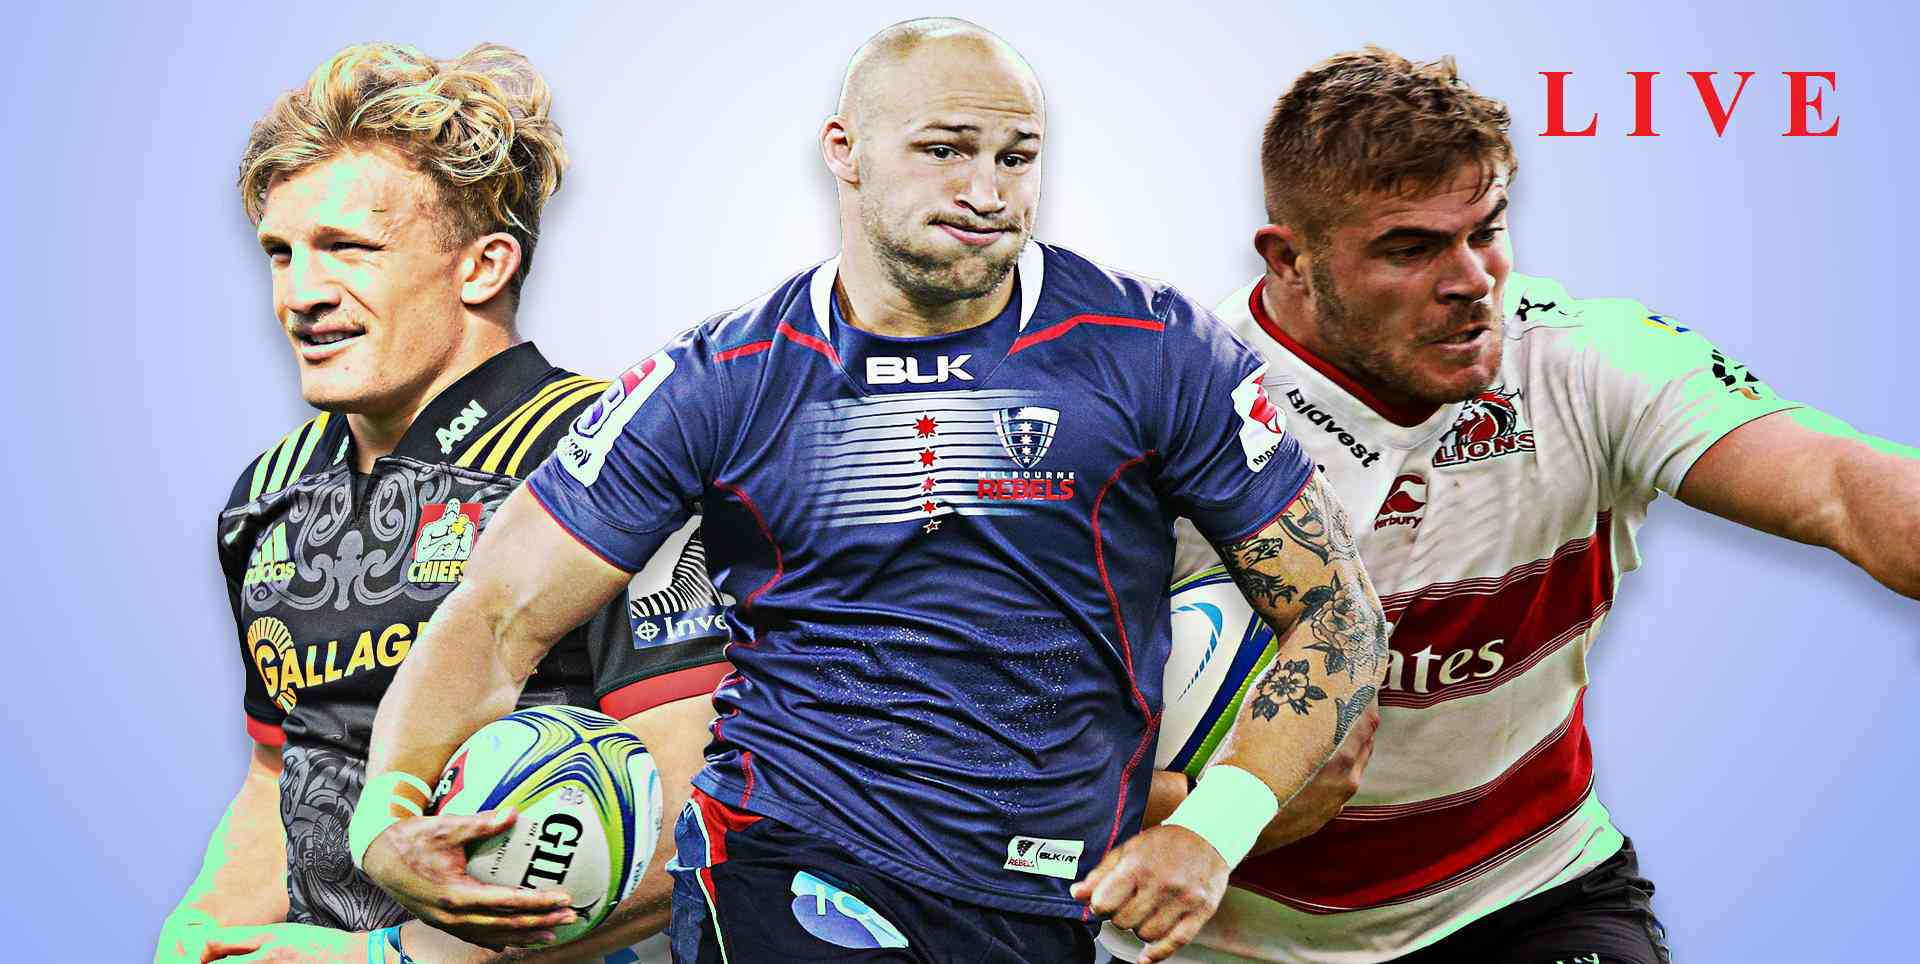 Wellington Vs Bay Of Plenty Rugby 2016 Online